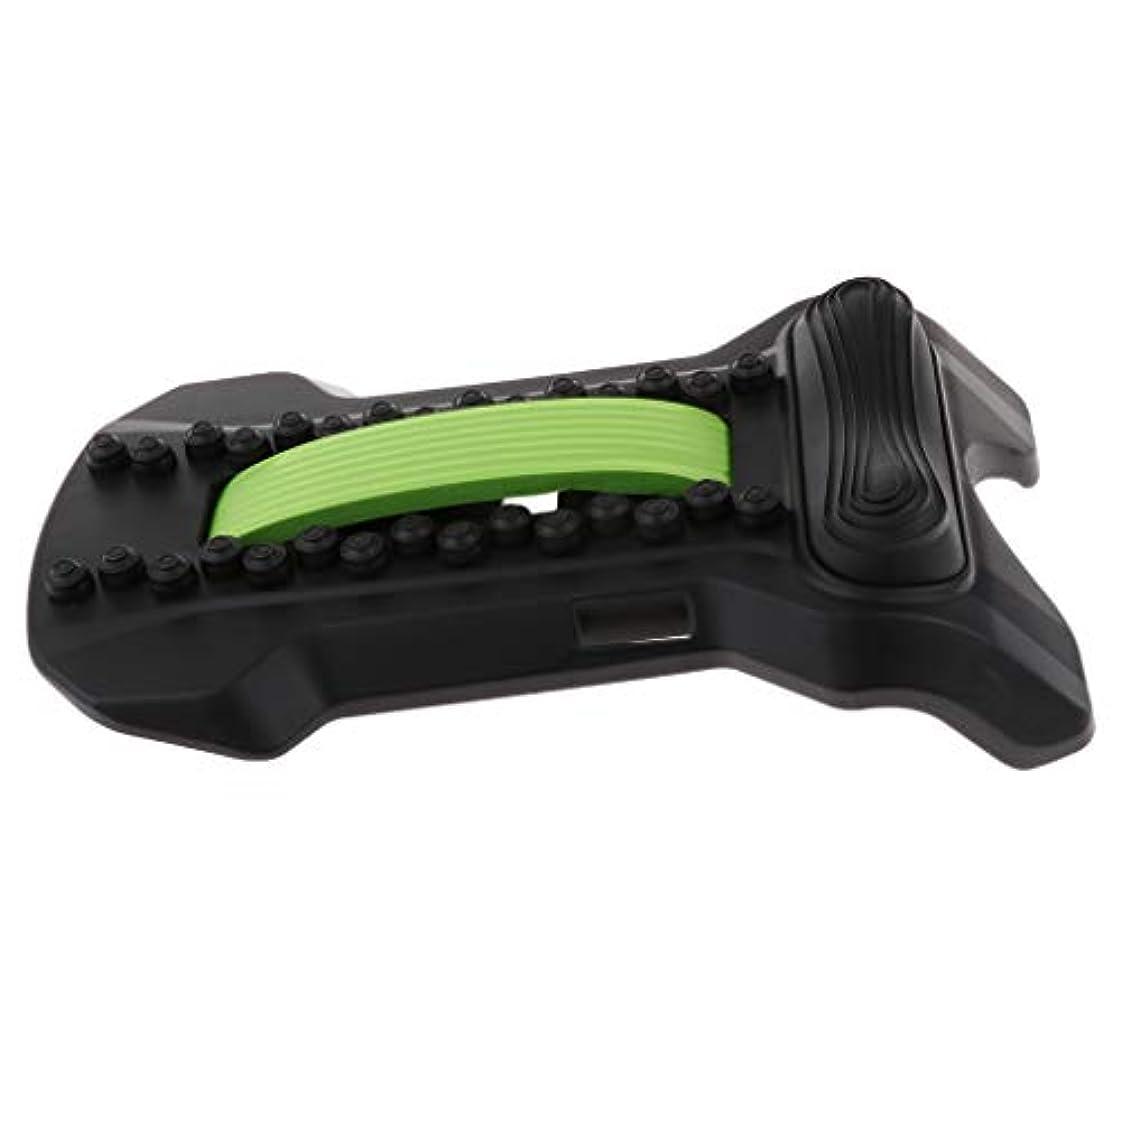 FLAMEER バックストレッチャー 腰椎 頸椎 腰痛 肩こり 解消 ツボ押し ストレッチ 姿勢 矯正 軽量 全5色 - ブラックグリーン, 22×37×8cm